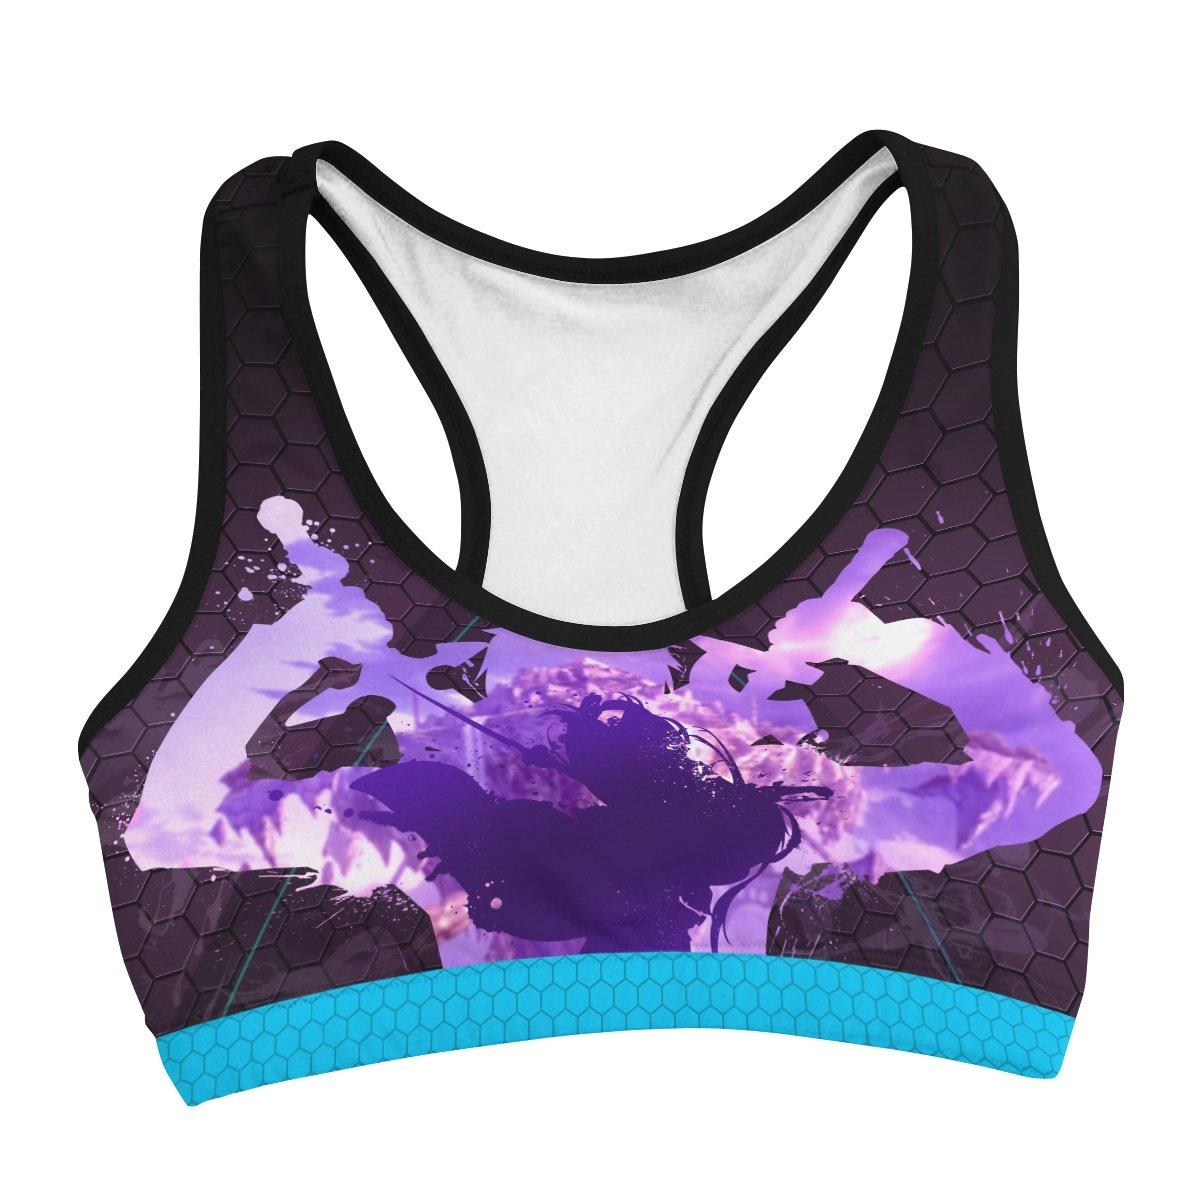 sao summer active wear set 405523 - Anime Swimsuits